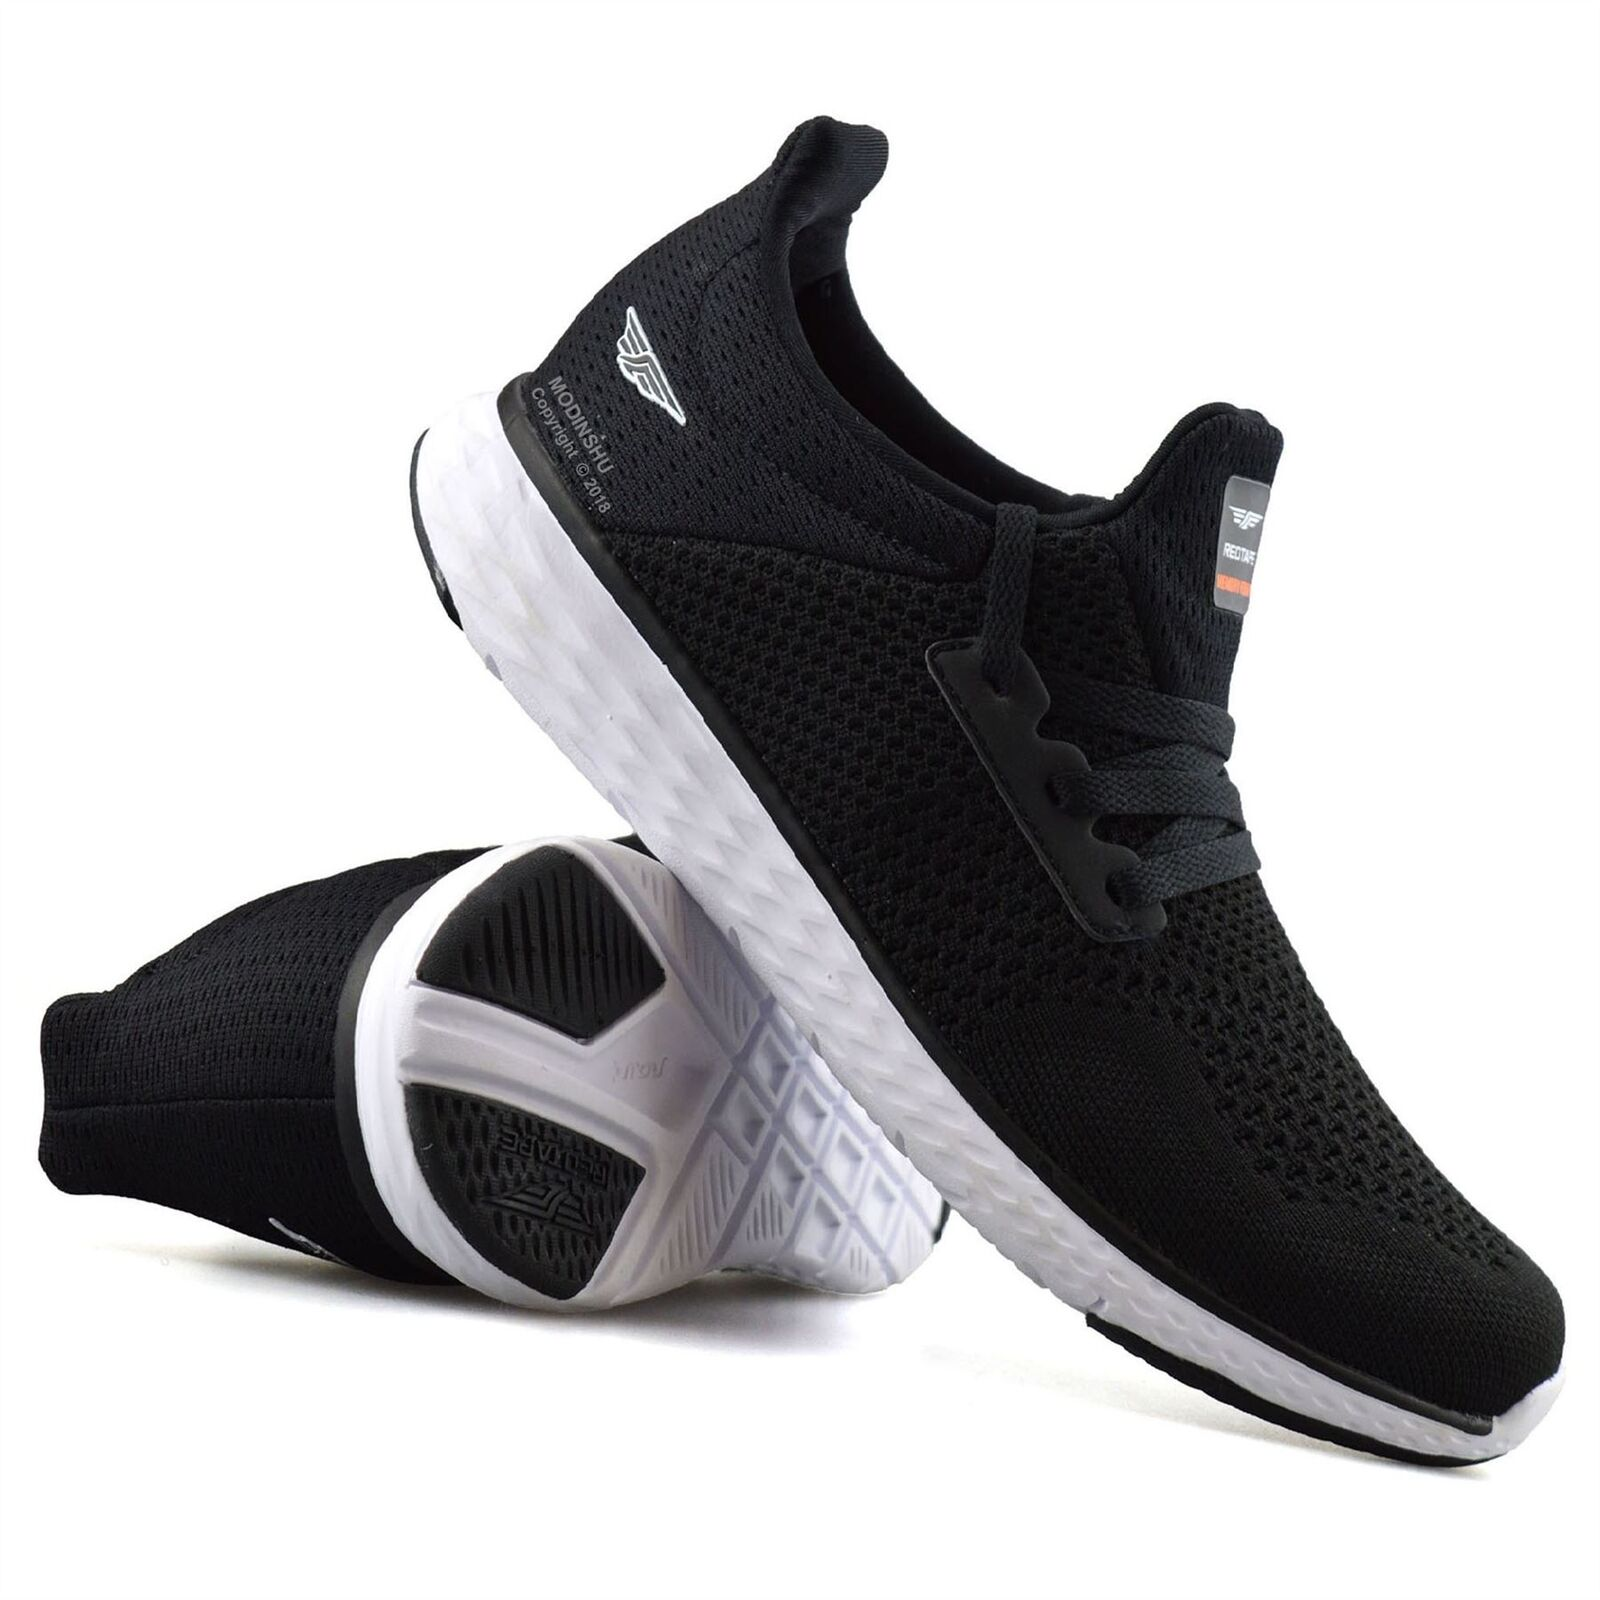 Hommes Sports Casual Walking Running Gym Sports Hommes Mousse À Mémoire De Lacets Baskets Chaussures Taille 3ca6f3